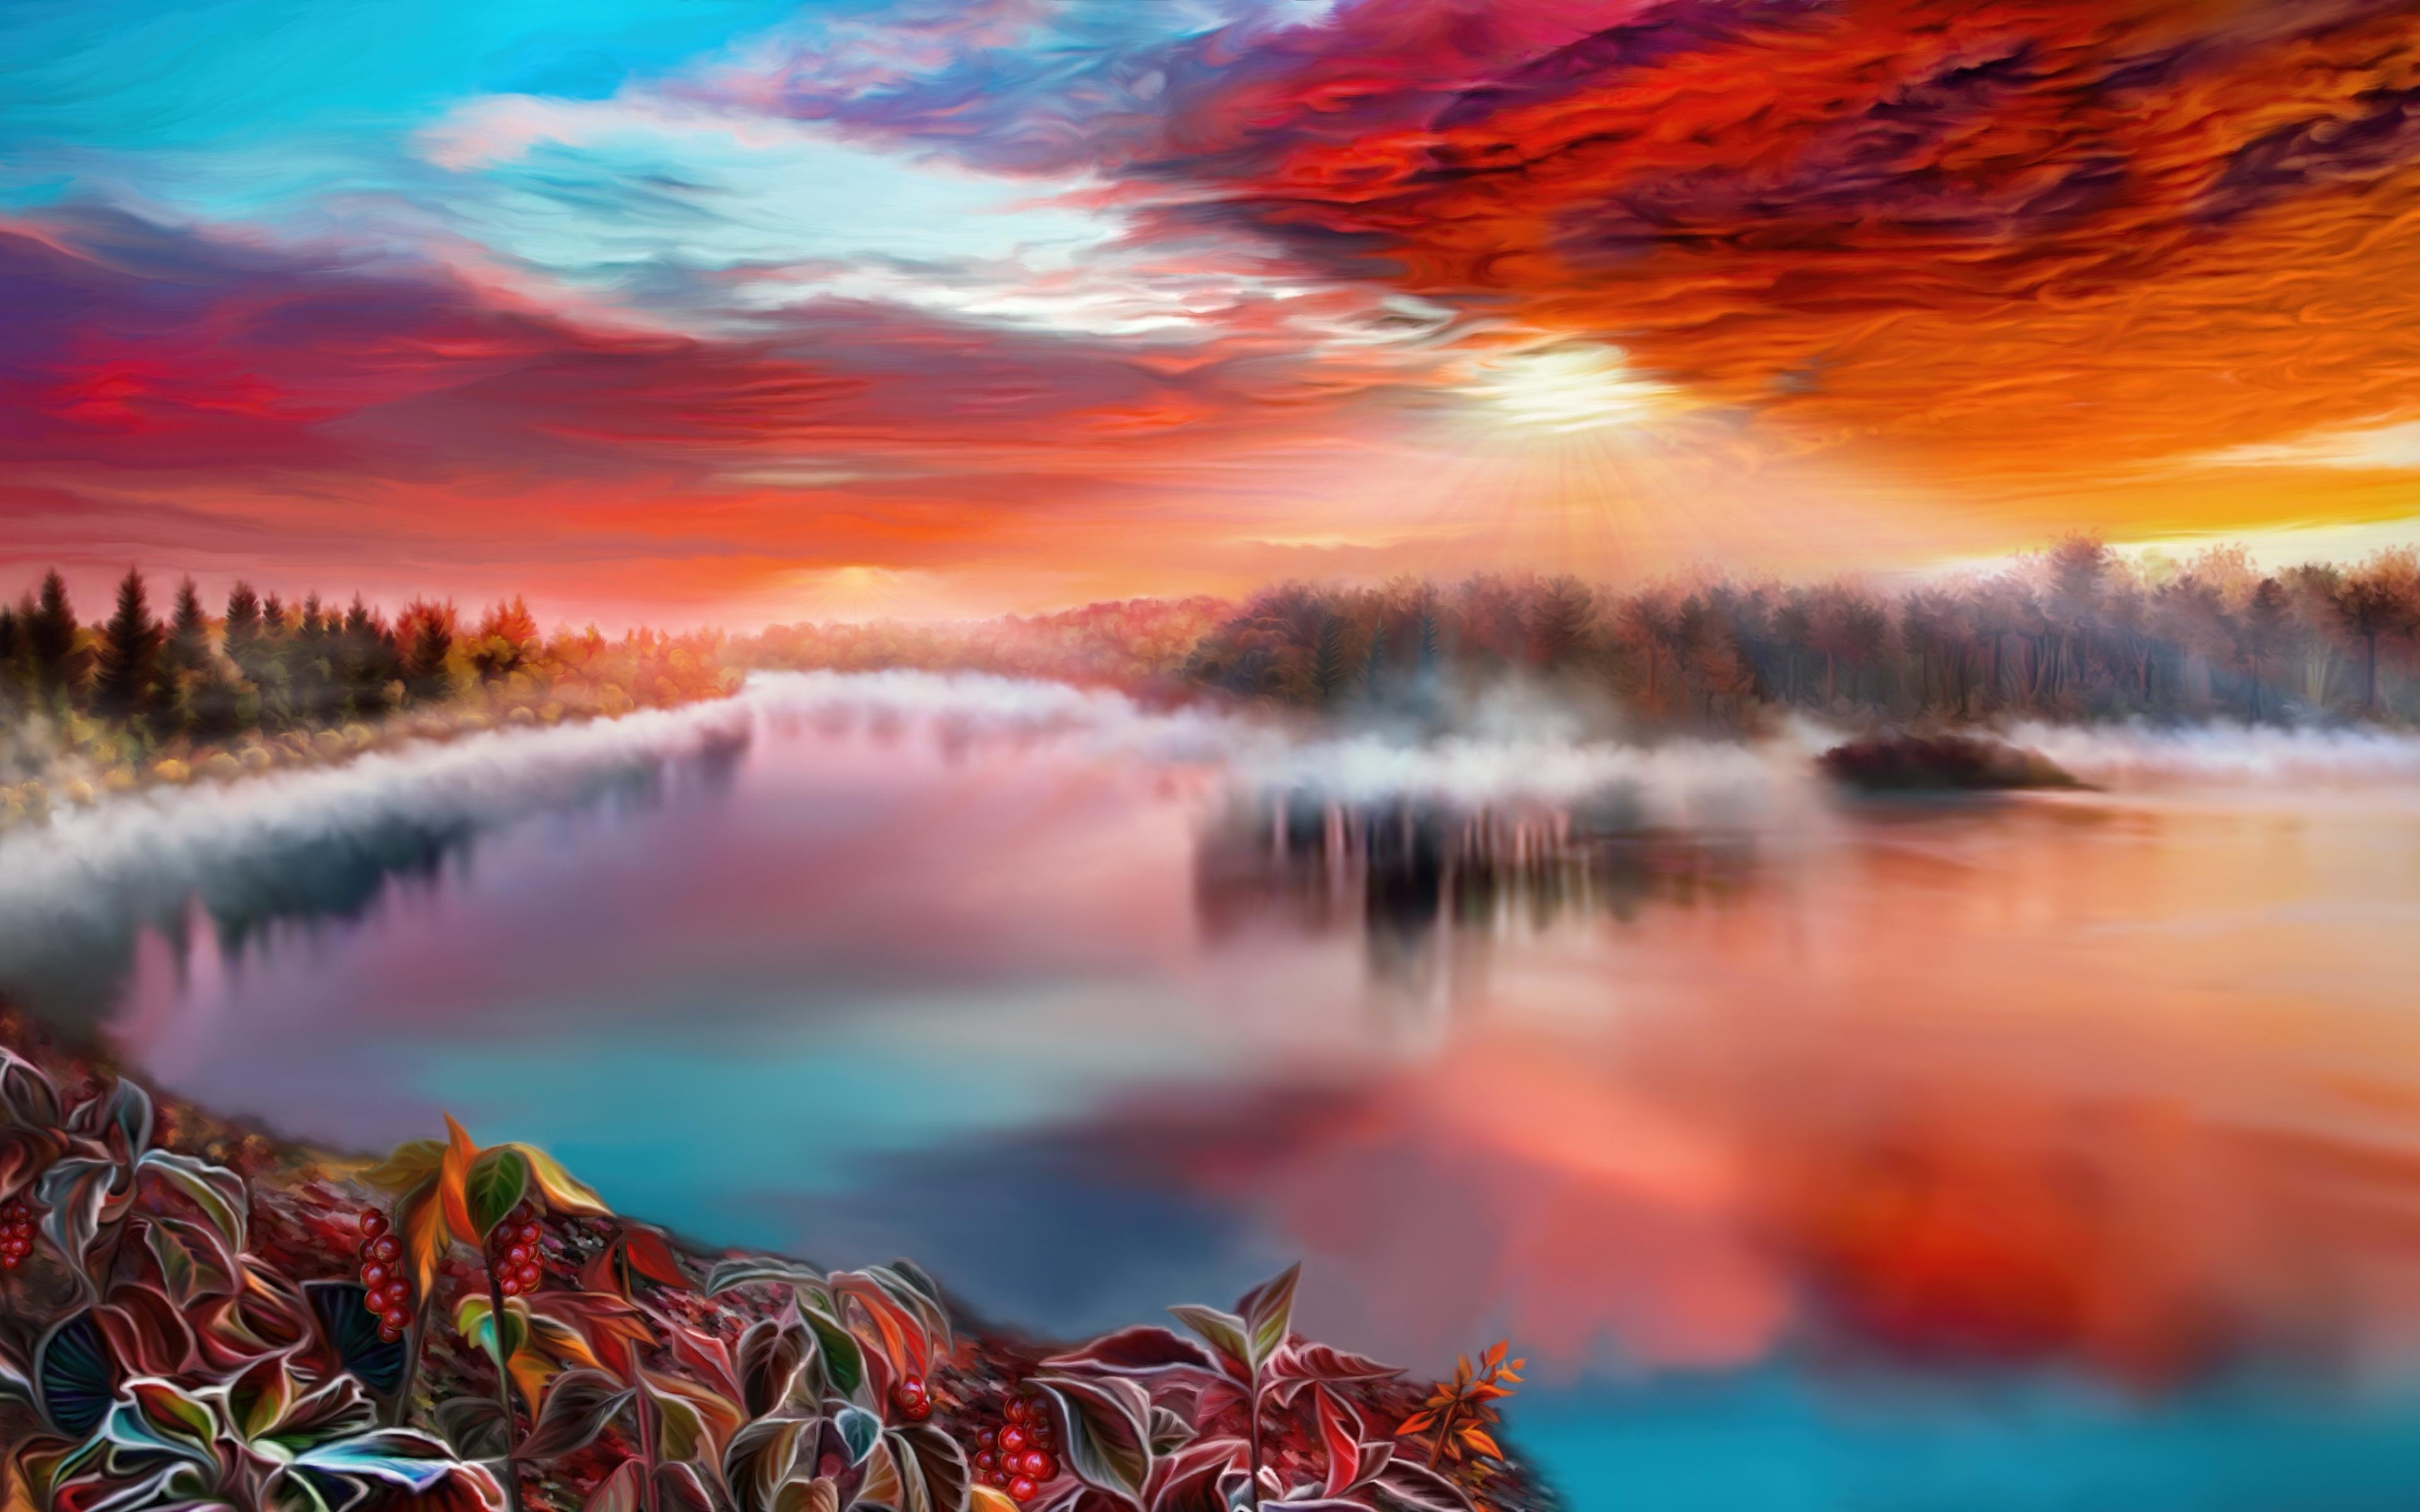 Winding River 4k Hd Desktop Wallpaper For 4k Ultra Hd Tv: Artistic River, HD 4K Wallpaper